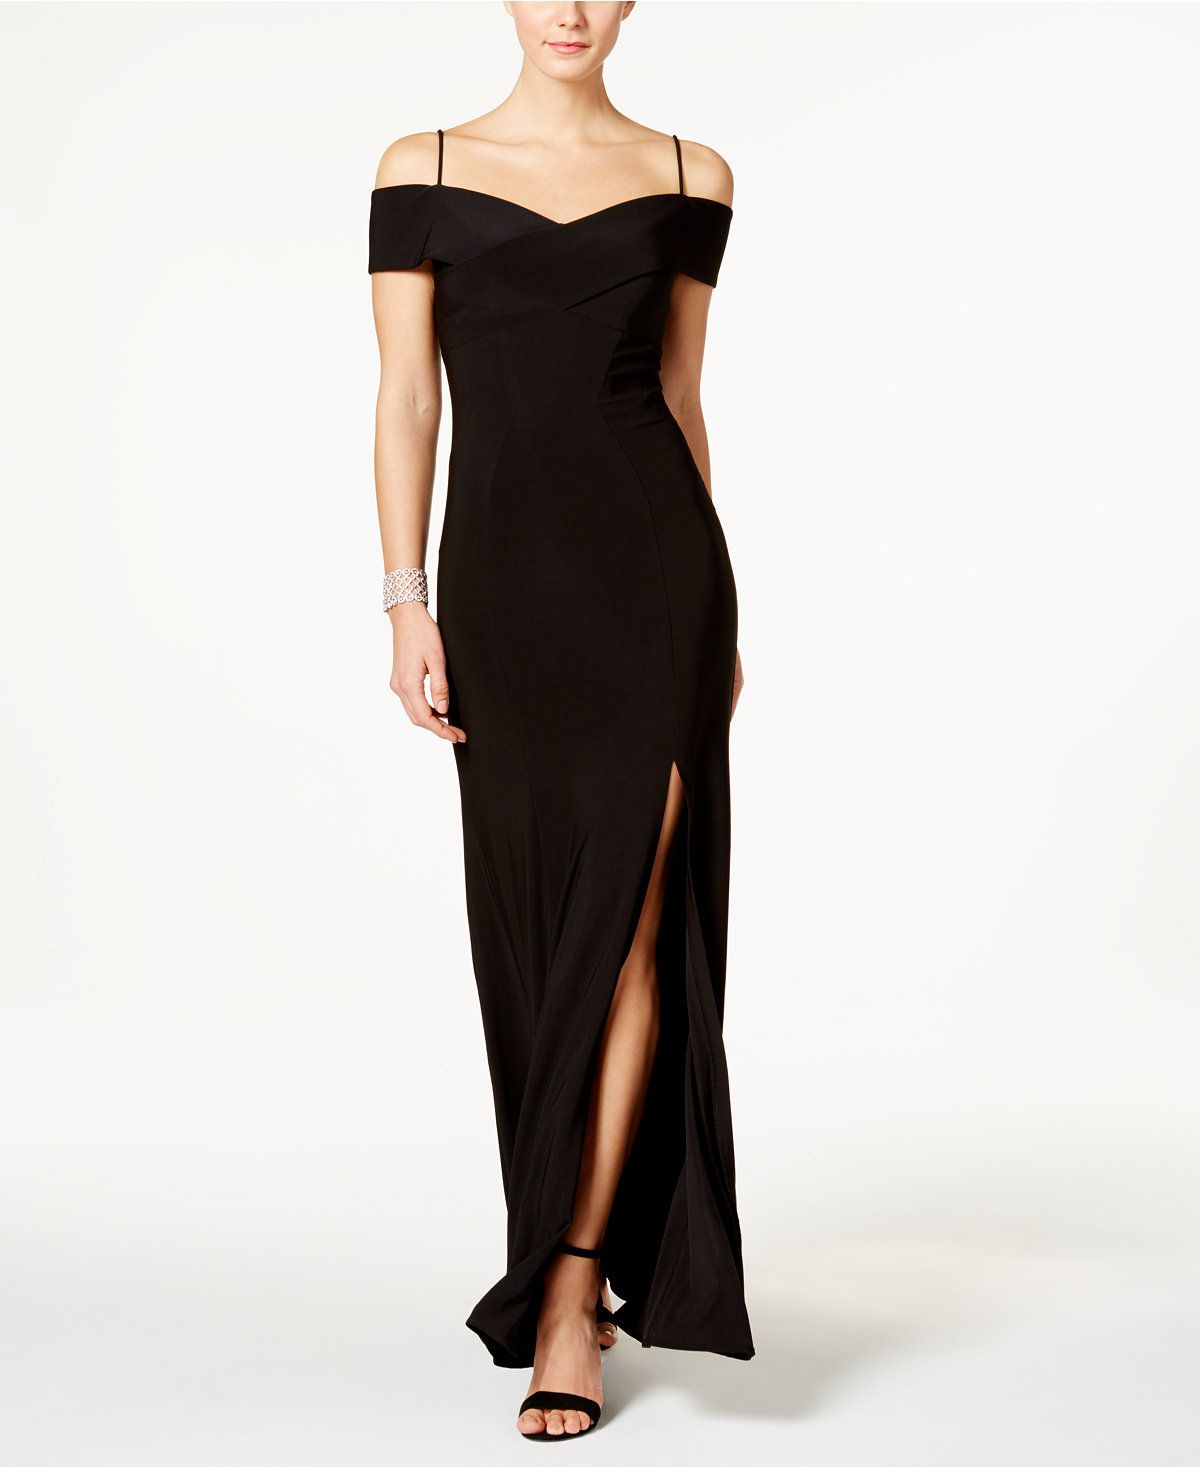 Pin On Black Tie Dress,Sophia Tolli Plus Size Wedding Dresses